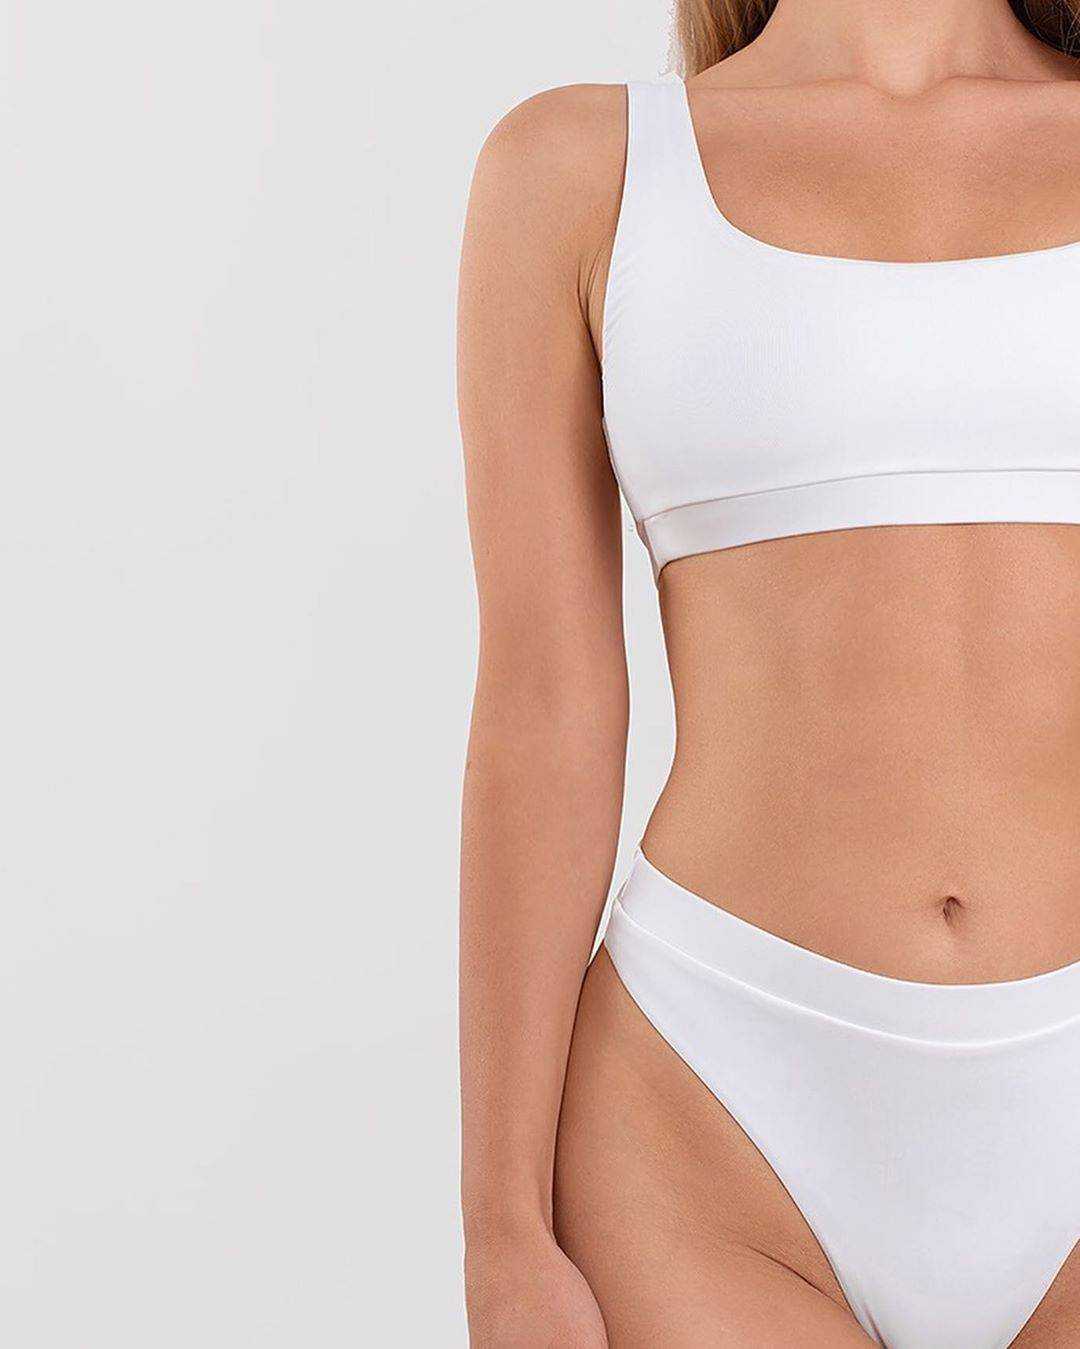 2020 High Waist Bathing Suits Push Up Sexy Yellow Swimsuit Women Sport Crop Bikini Sets Woman Beach Swimwear Brazilian Clothes